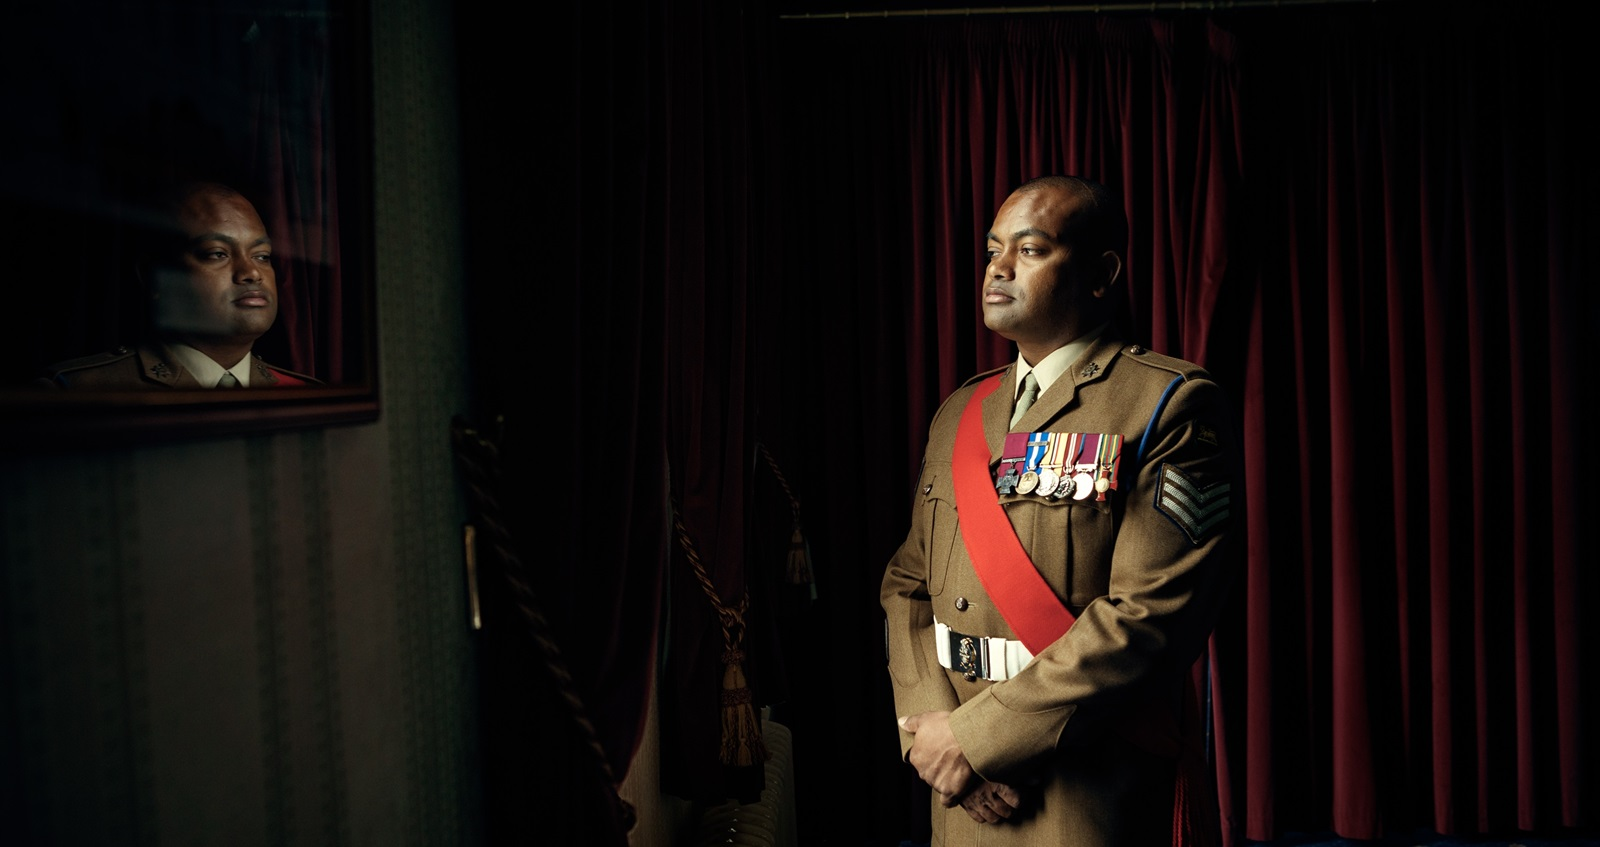 Sergeant  Johnson Beharry in uniform